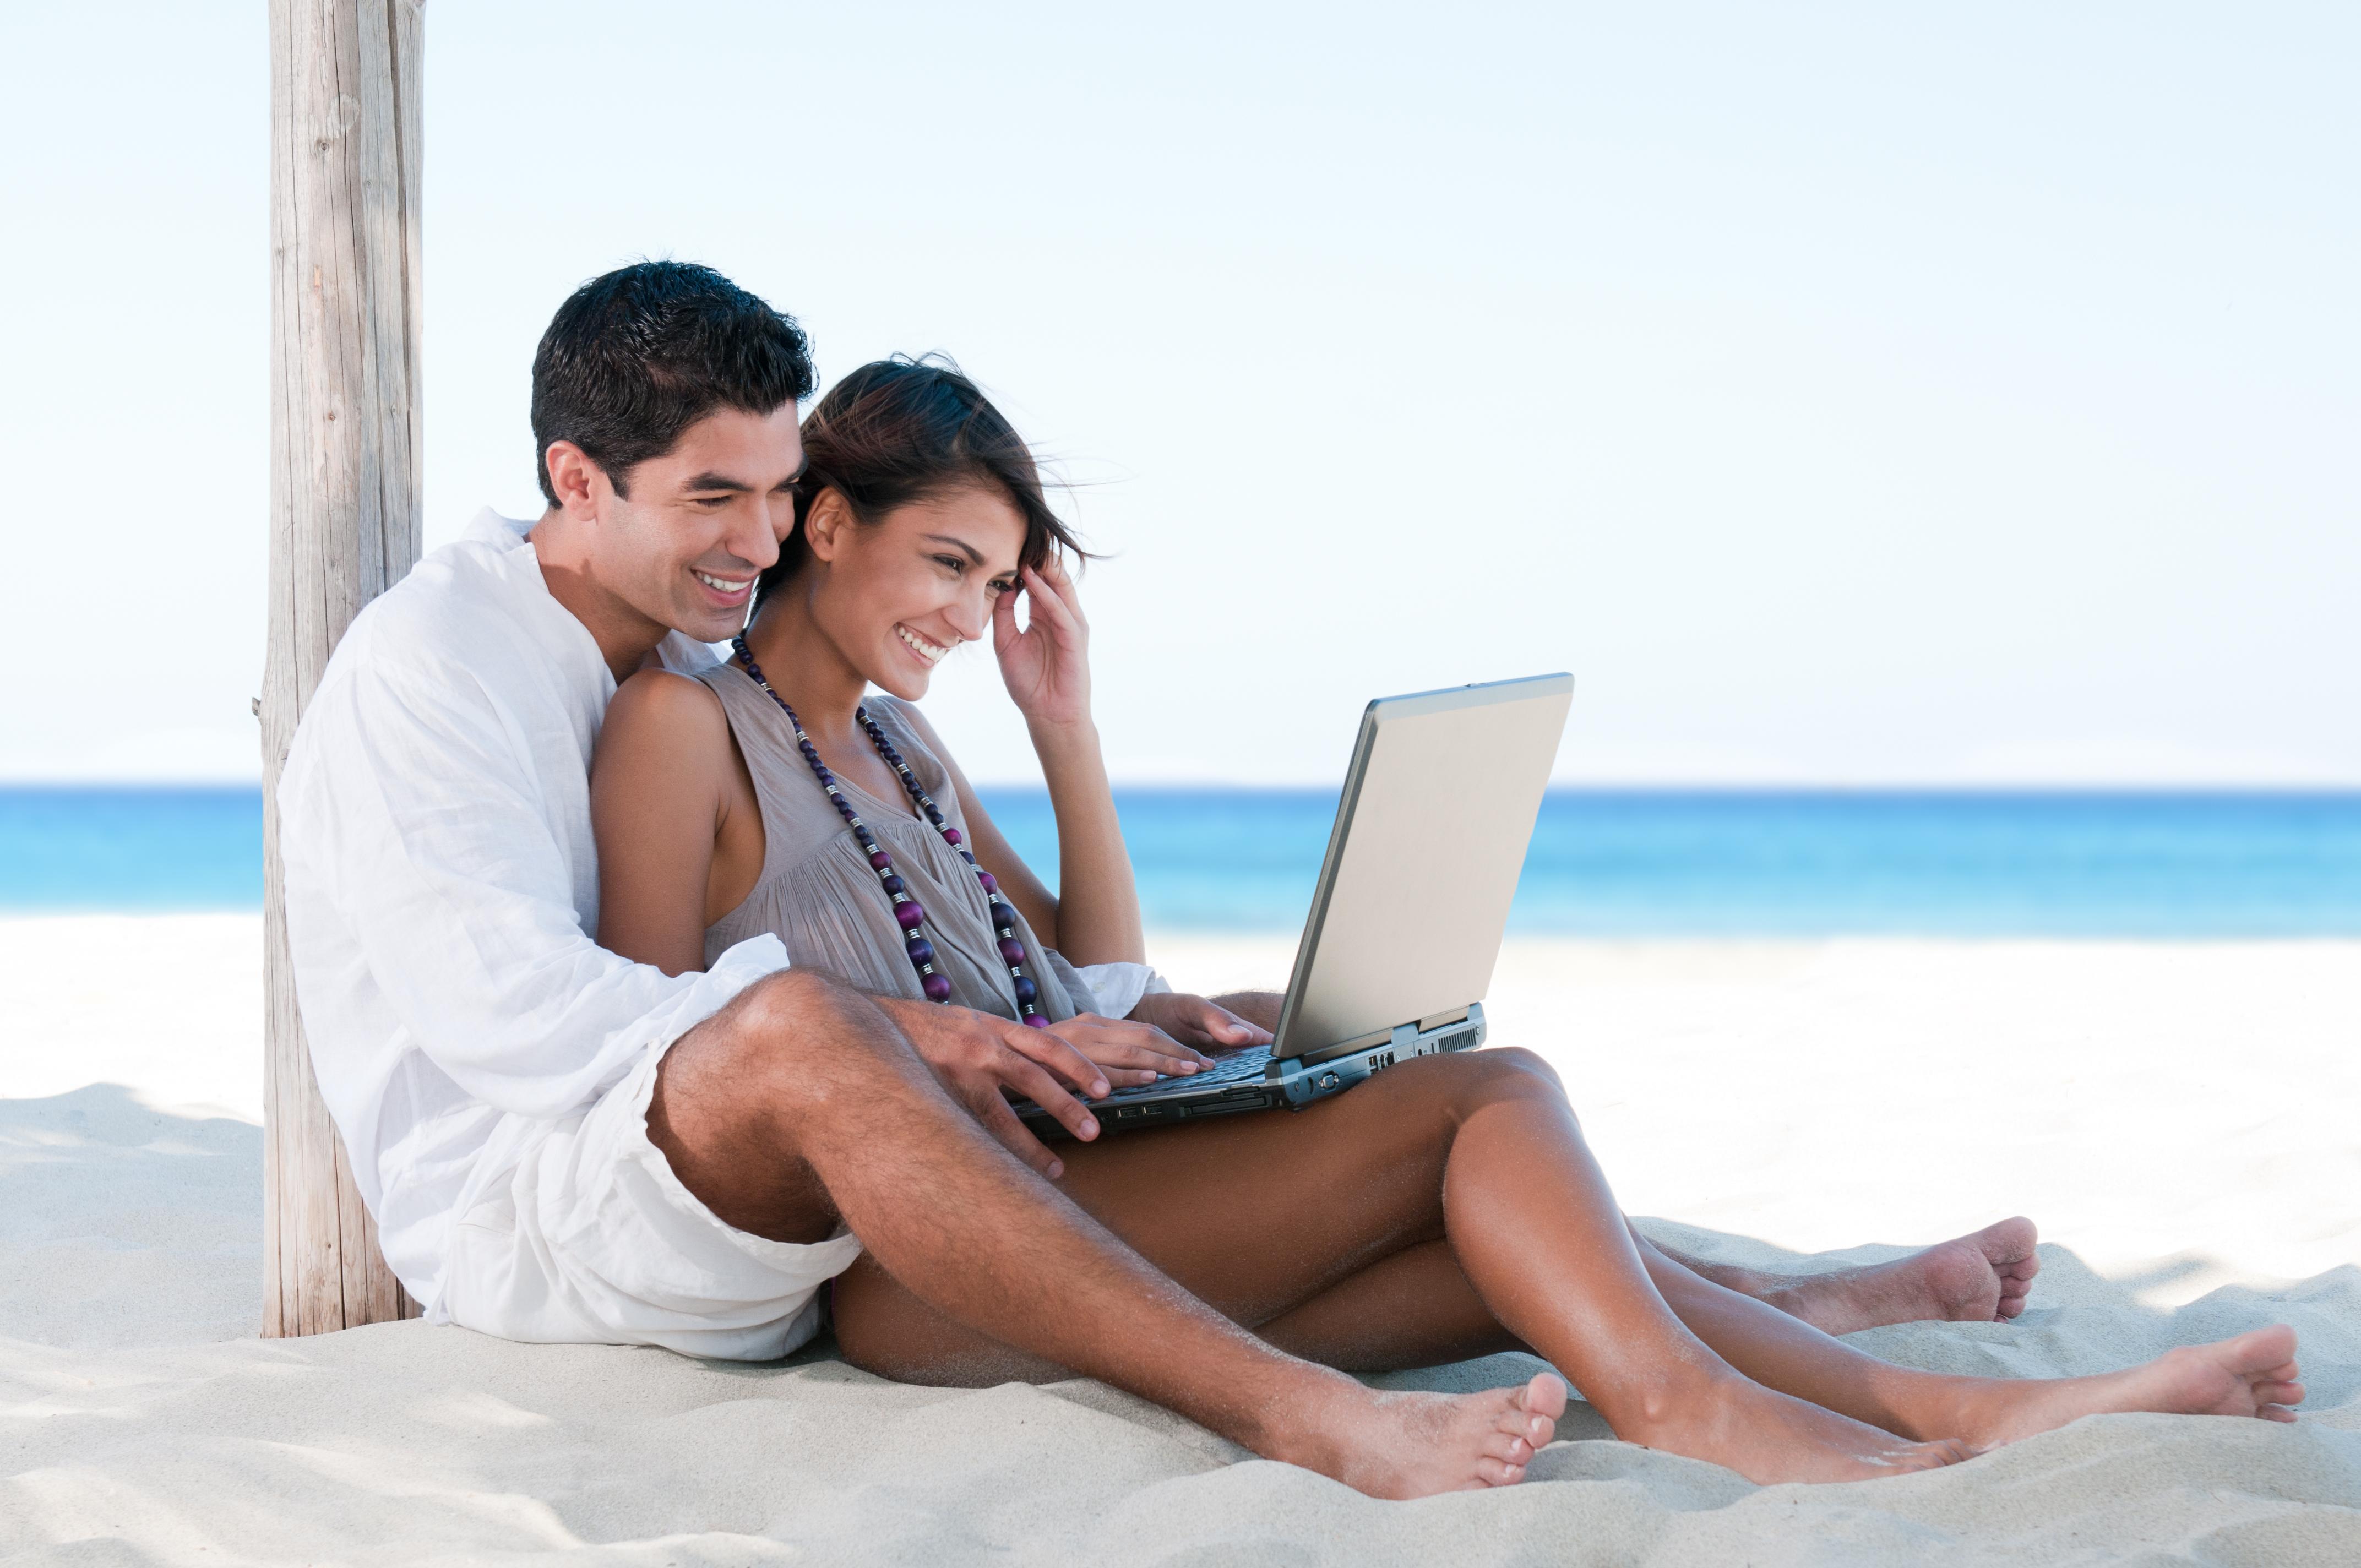 alabama dating services